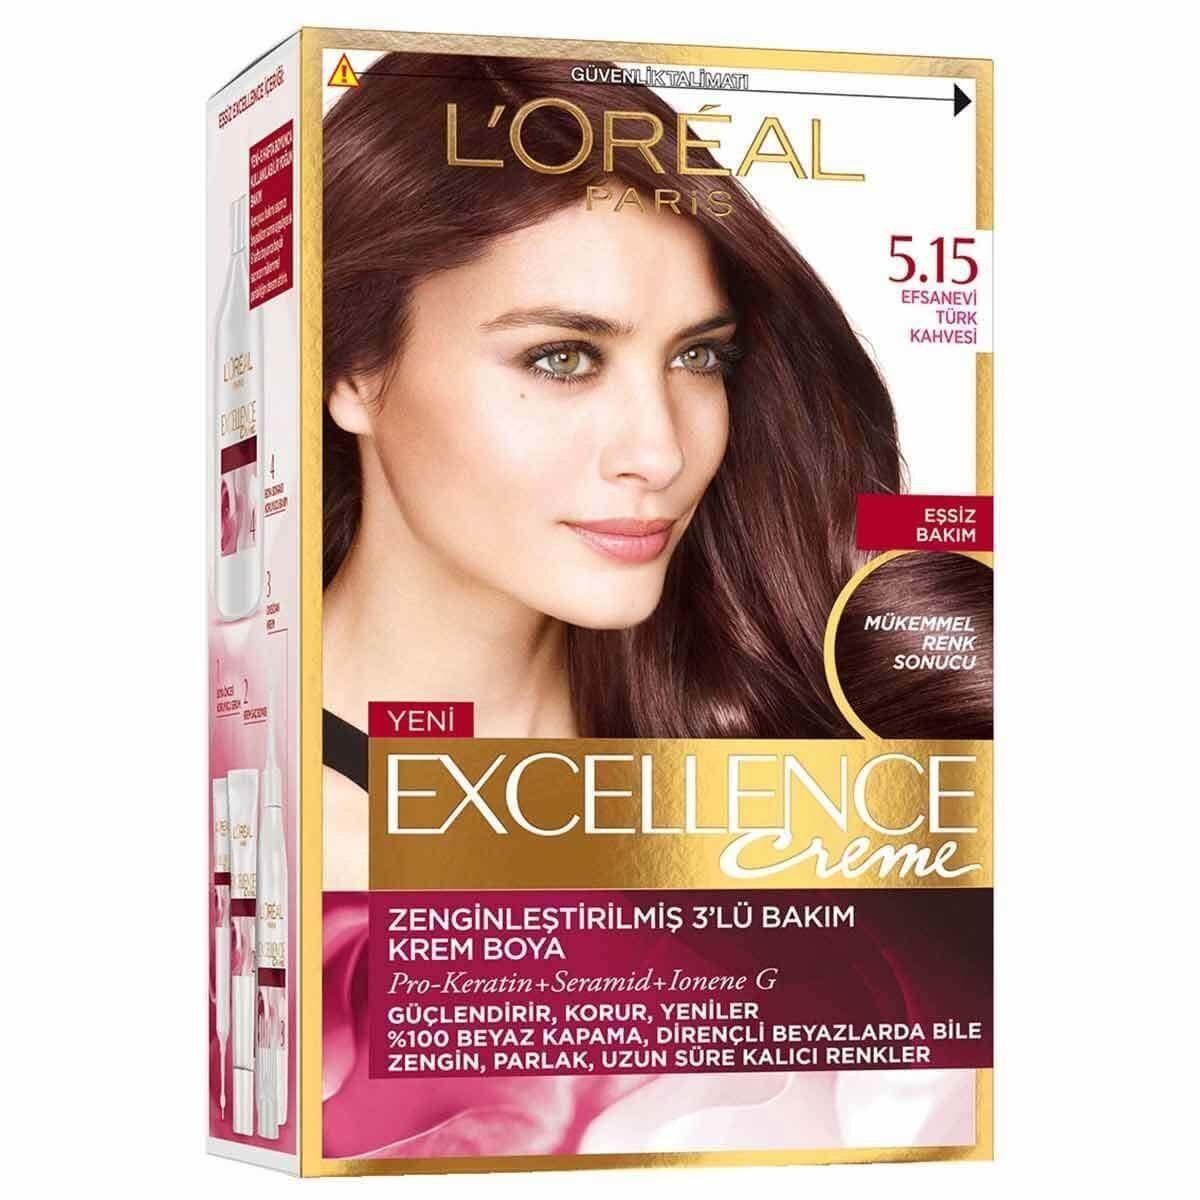 Loreal Excellence Sac Boyasi 5 15 Efsanevi Turk Kahvesi Cores